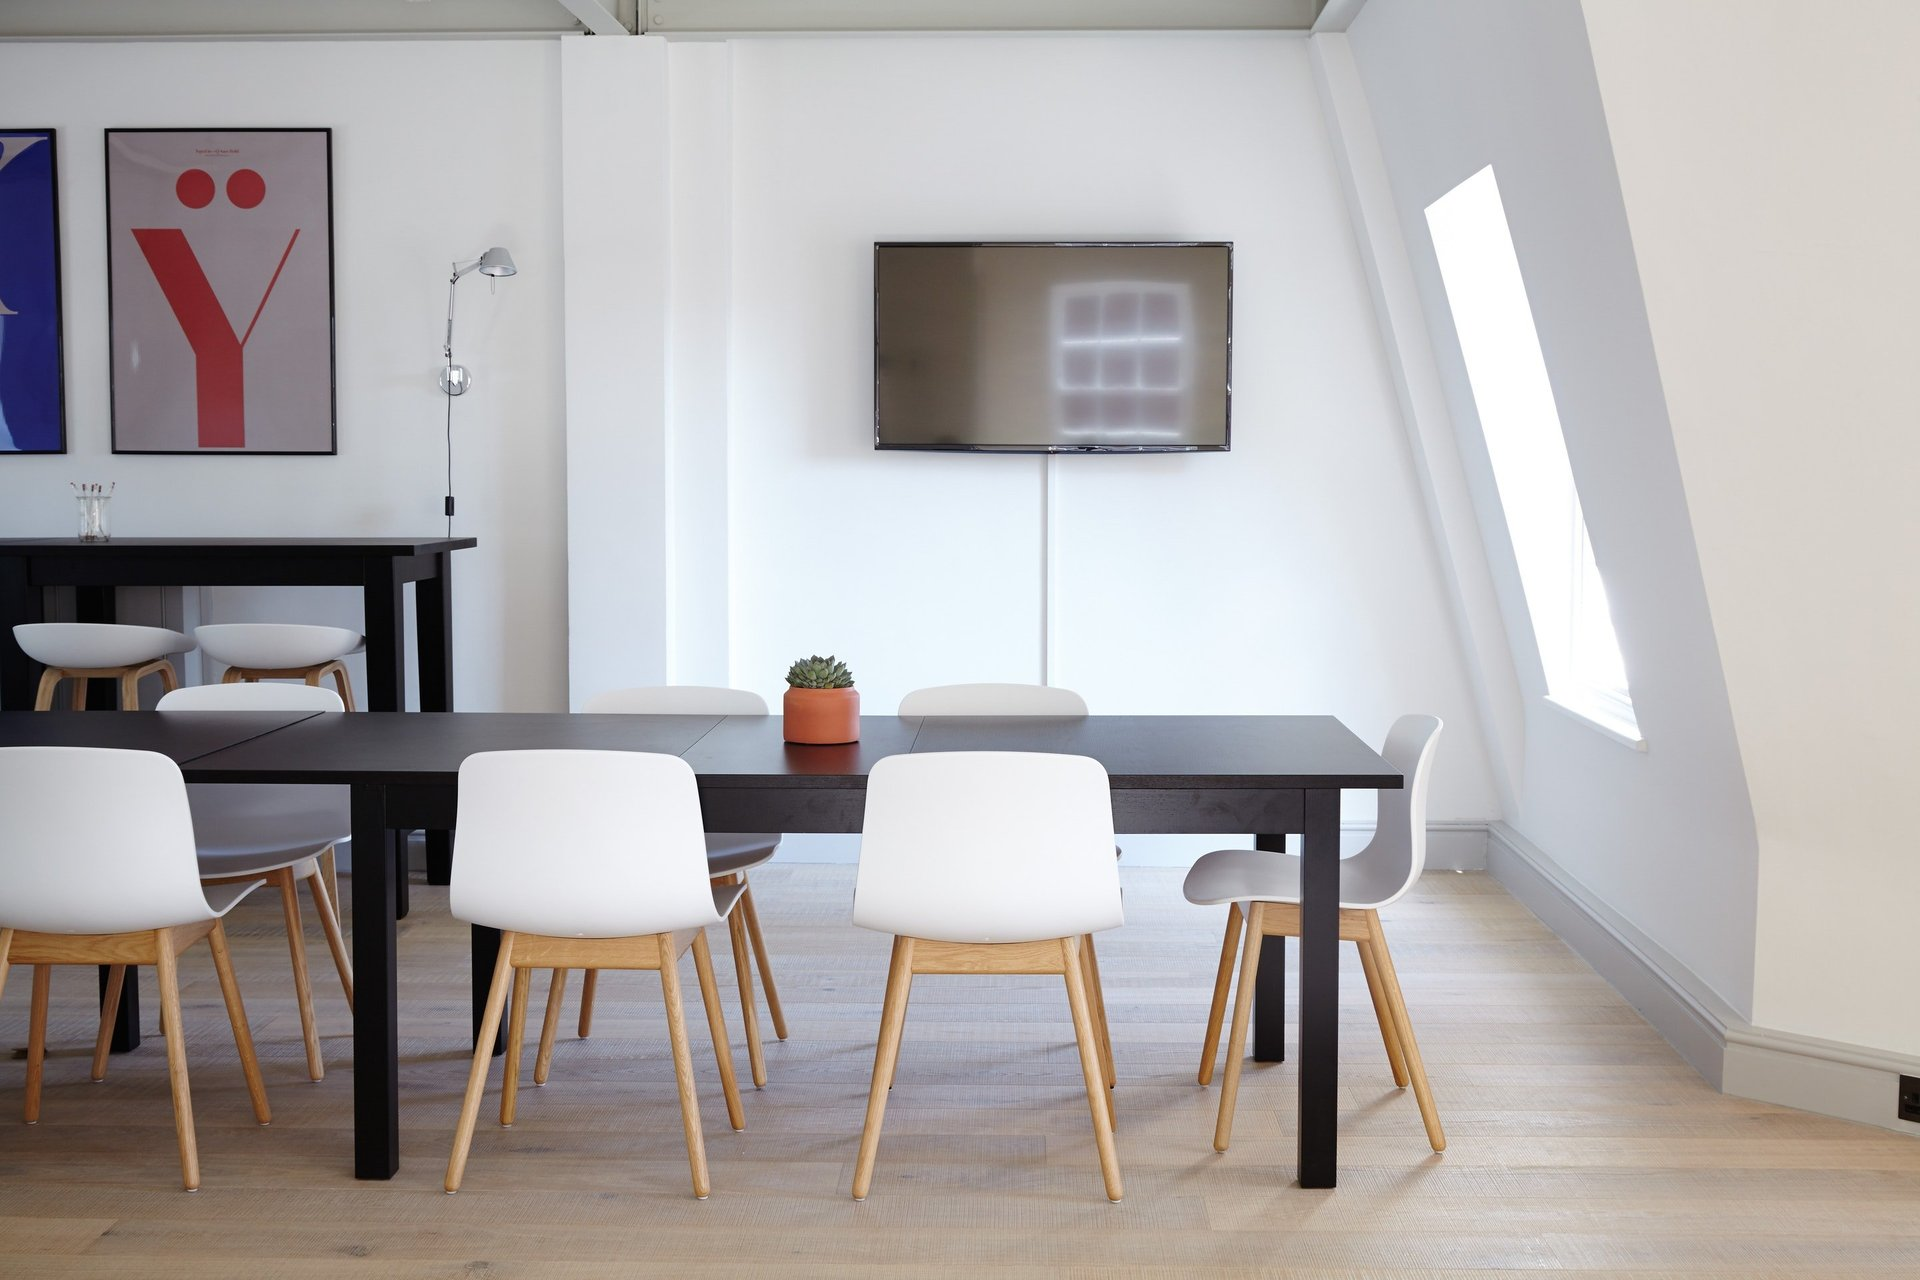 IncWorx SharePoint Customer Desk with White Chairs